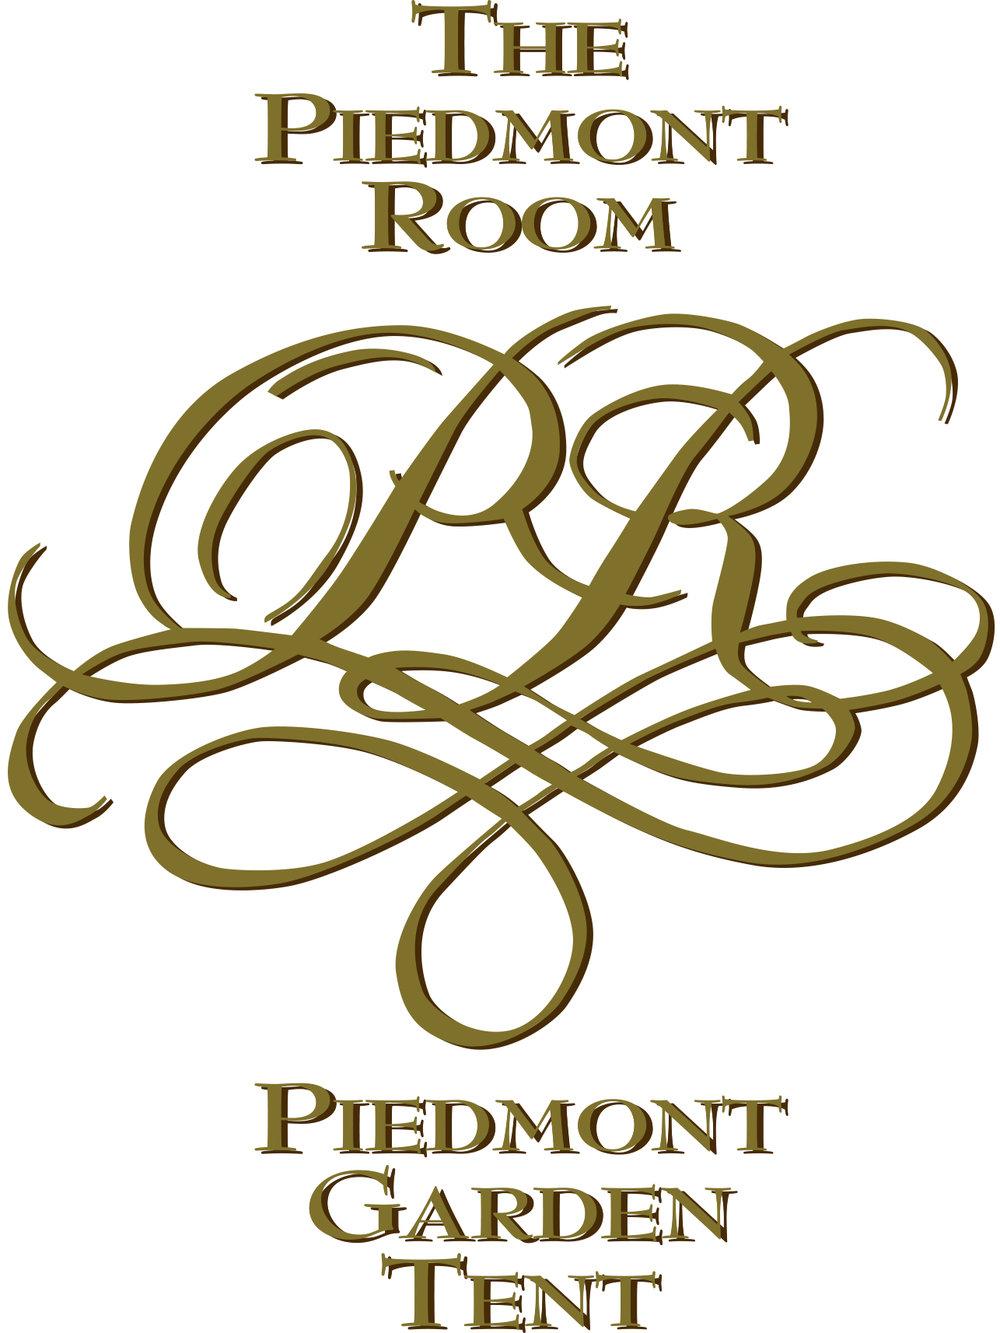 PR logo white background.jpg